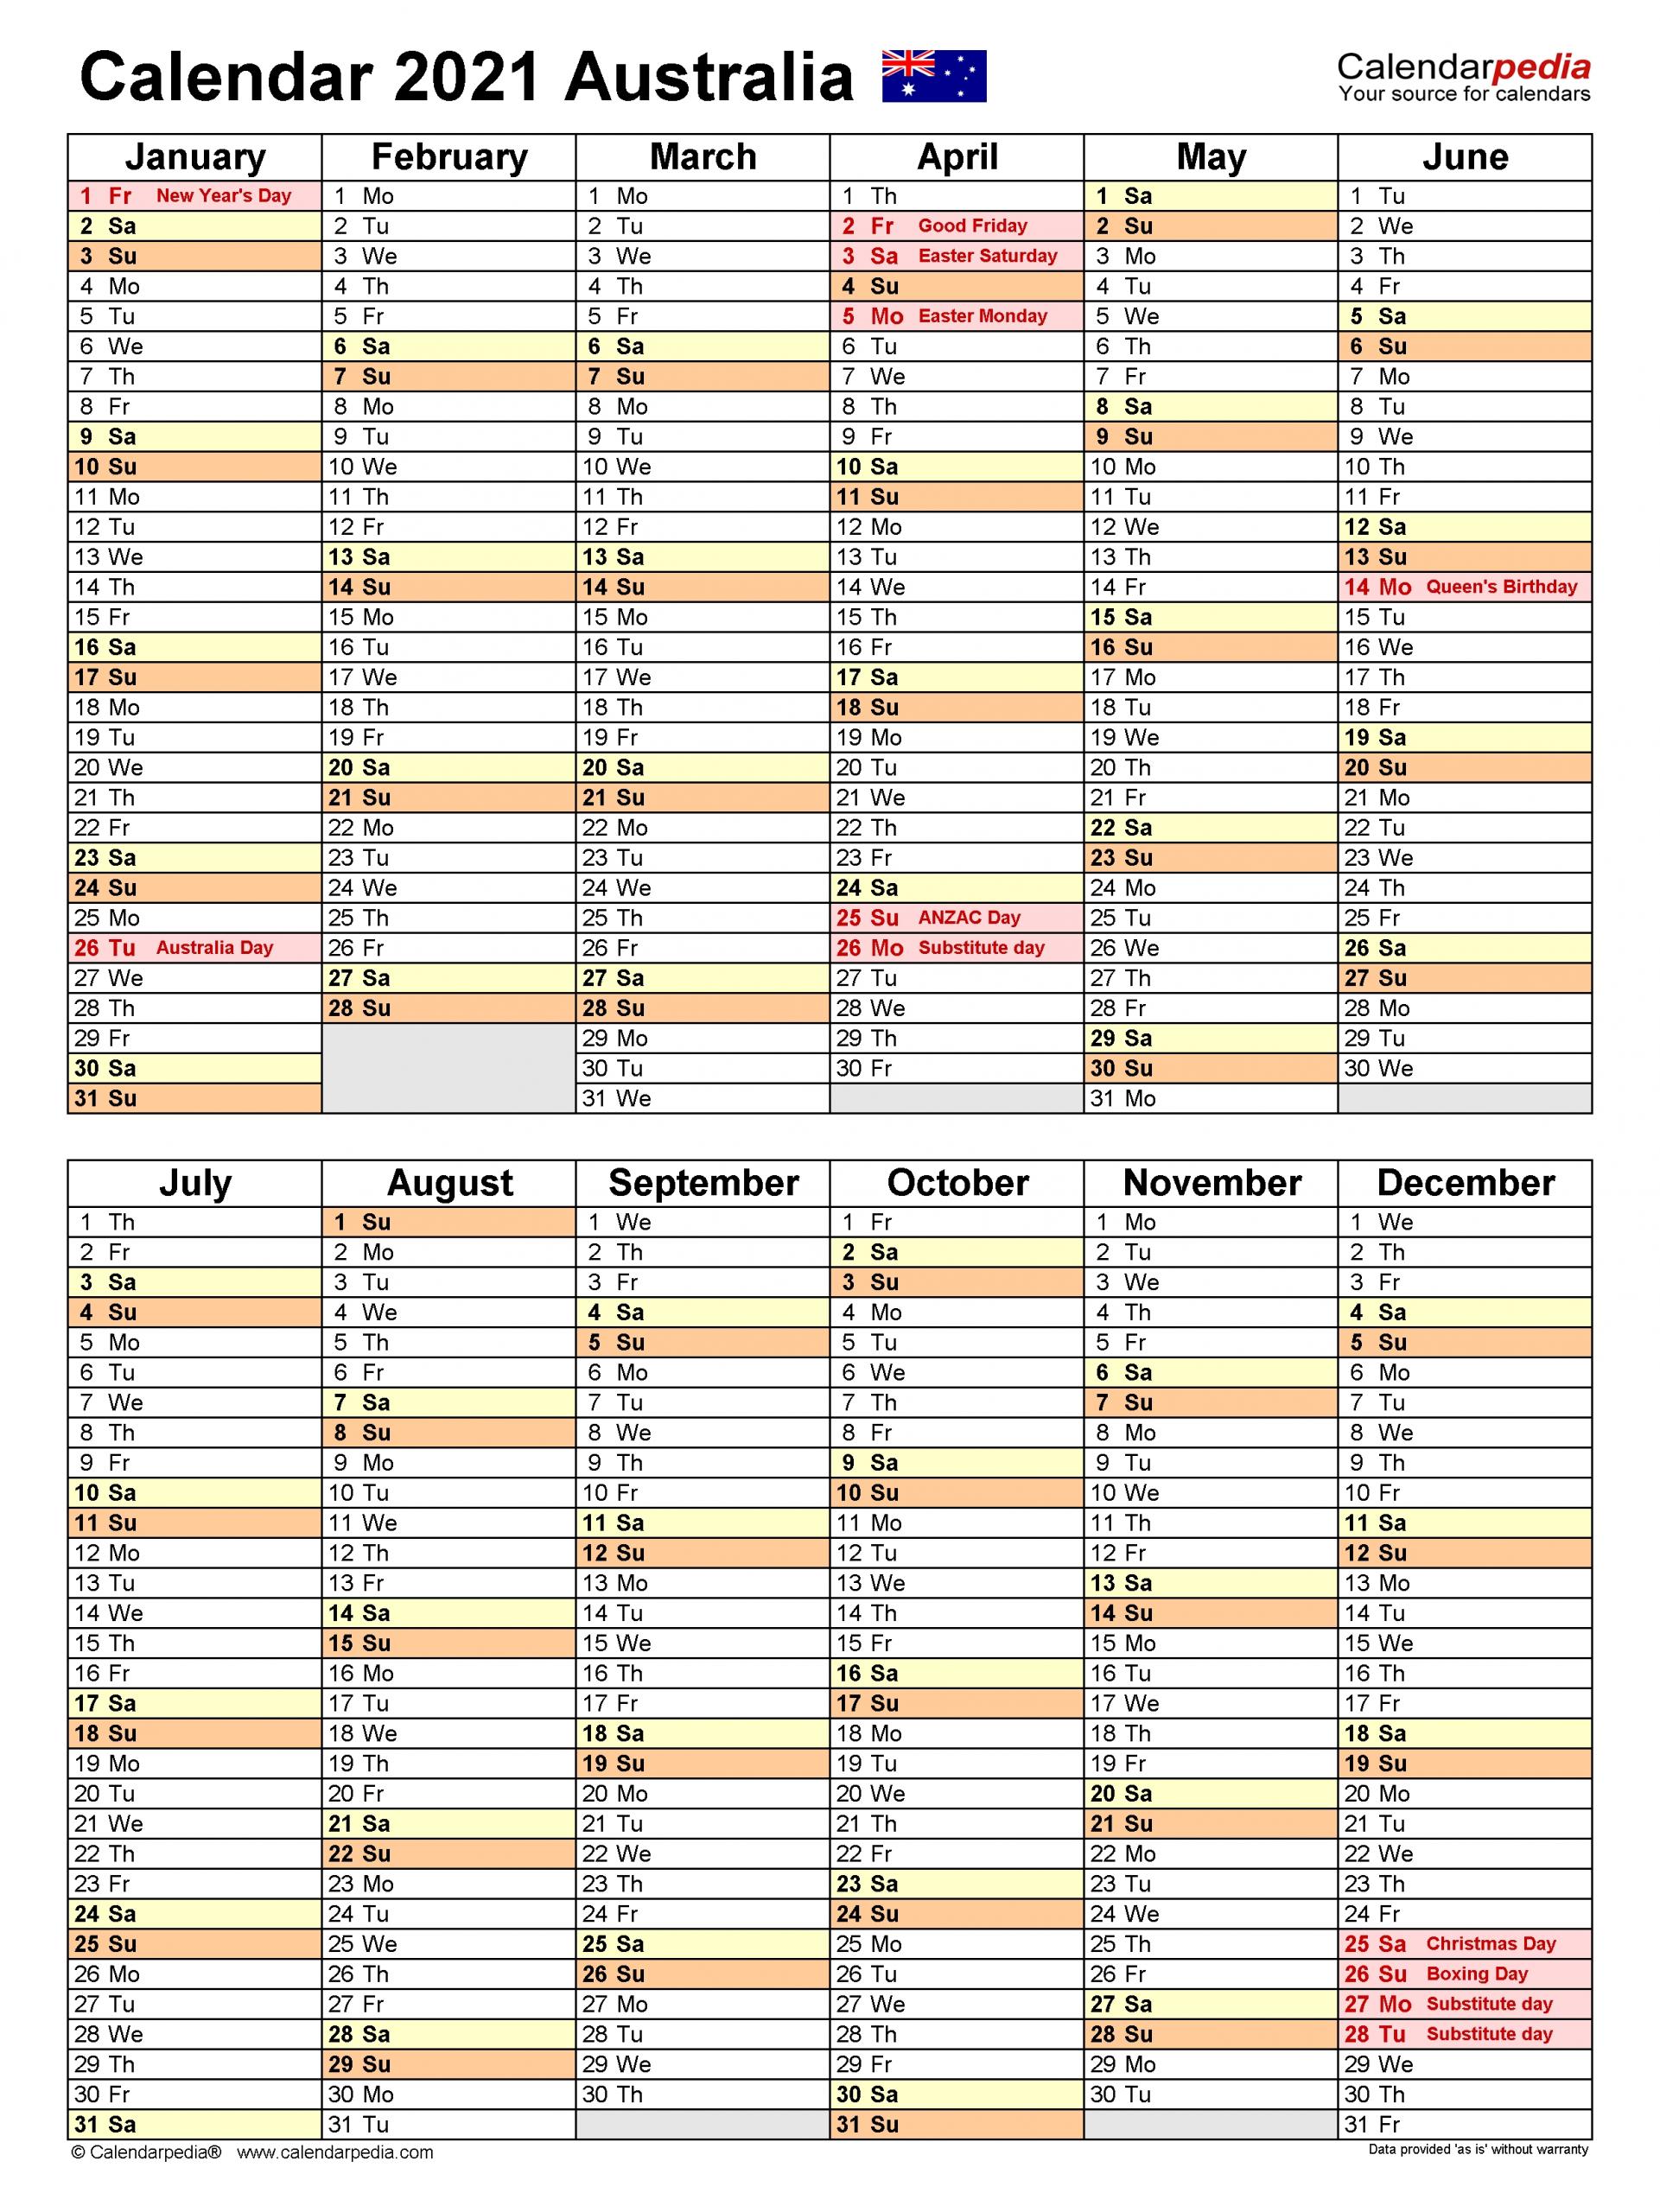 Australia Calendar 2021 - Free Printable Word Templates  2021 2021 Financial Calendar Australia